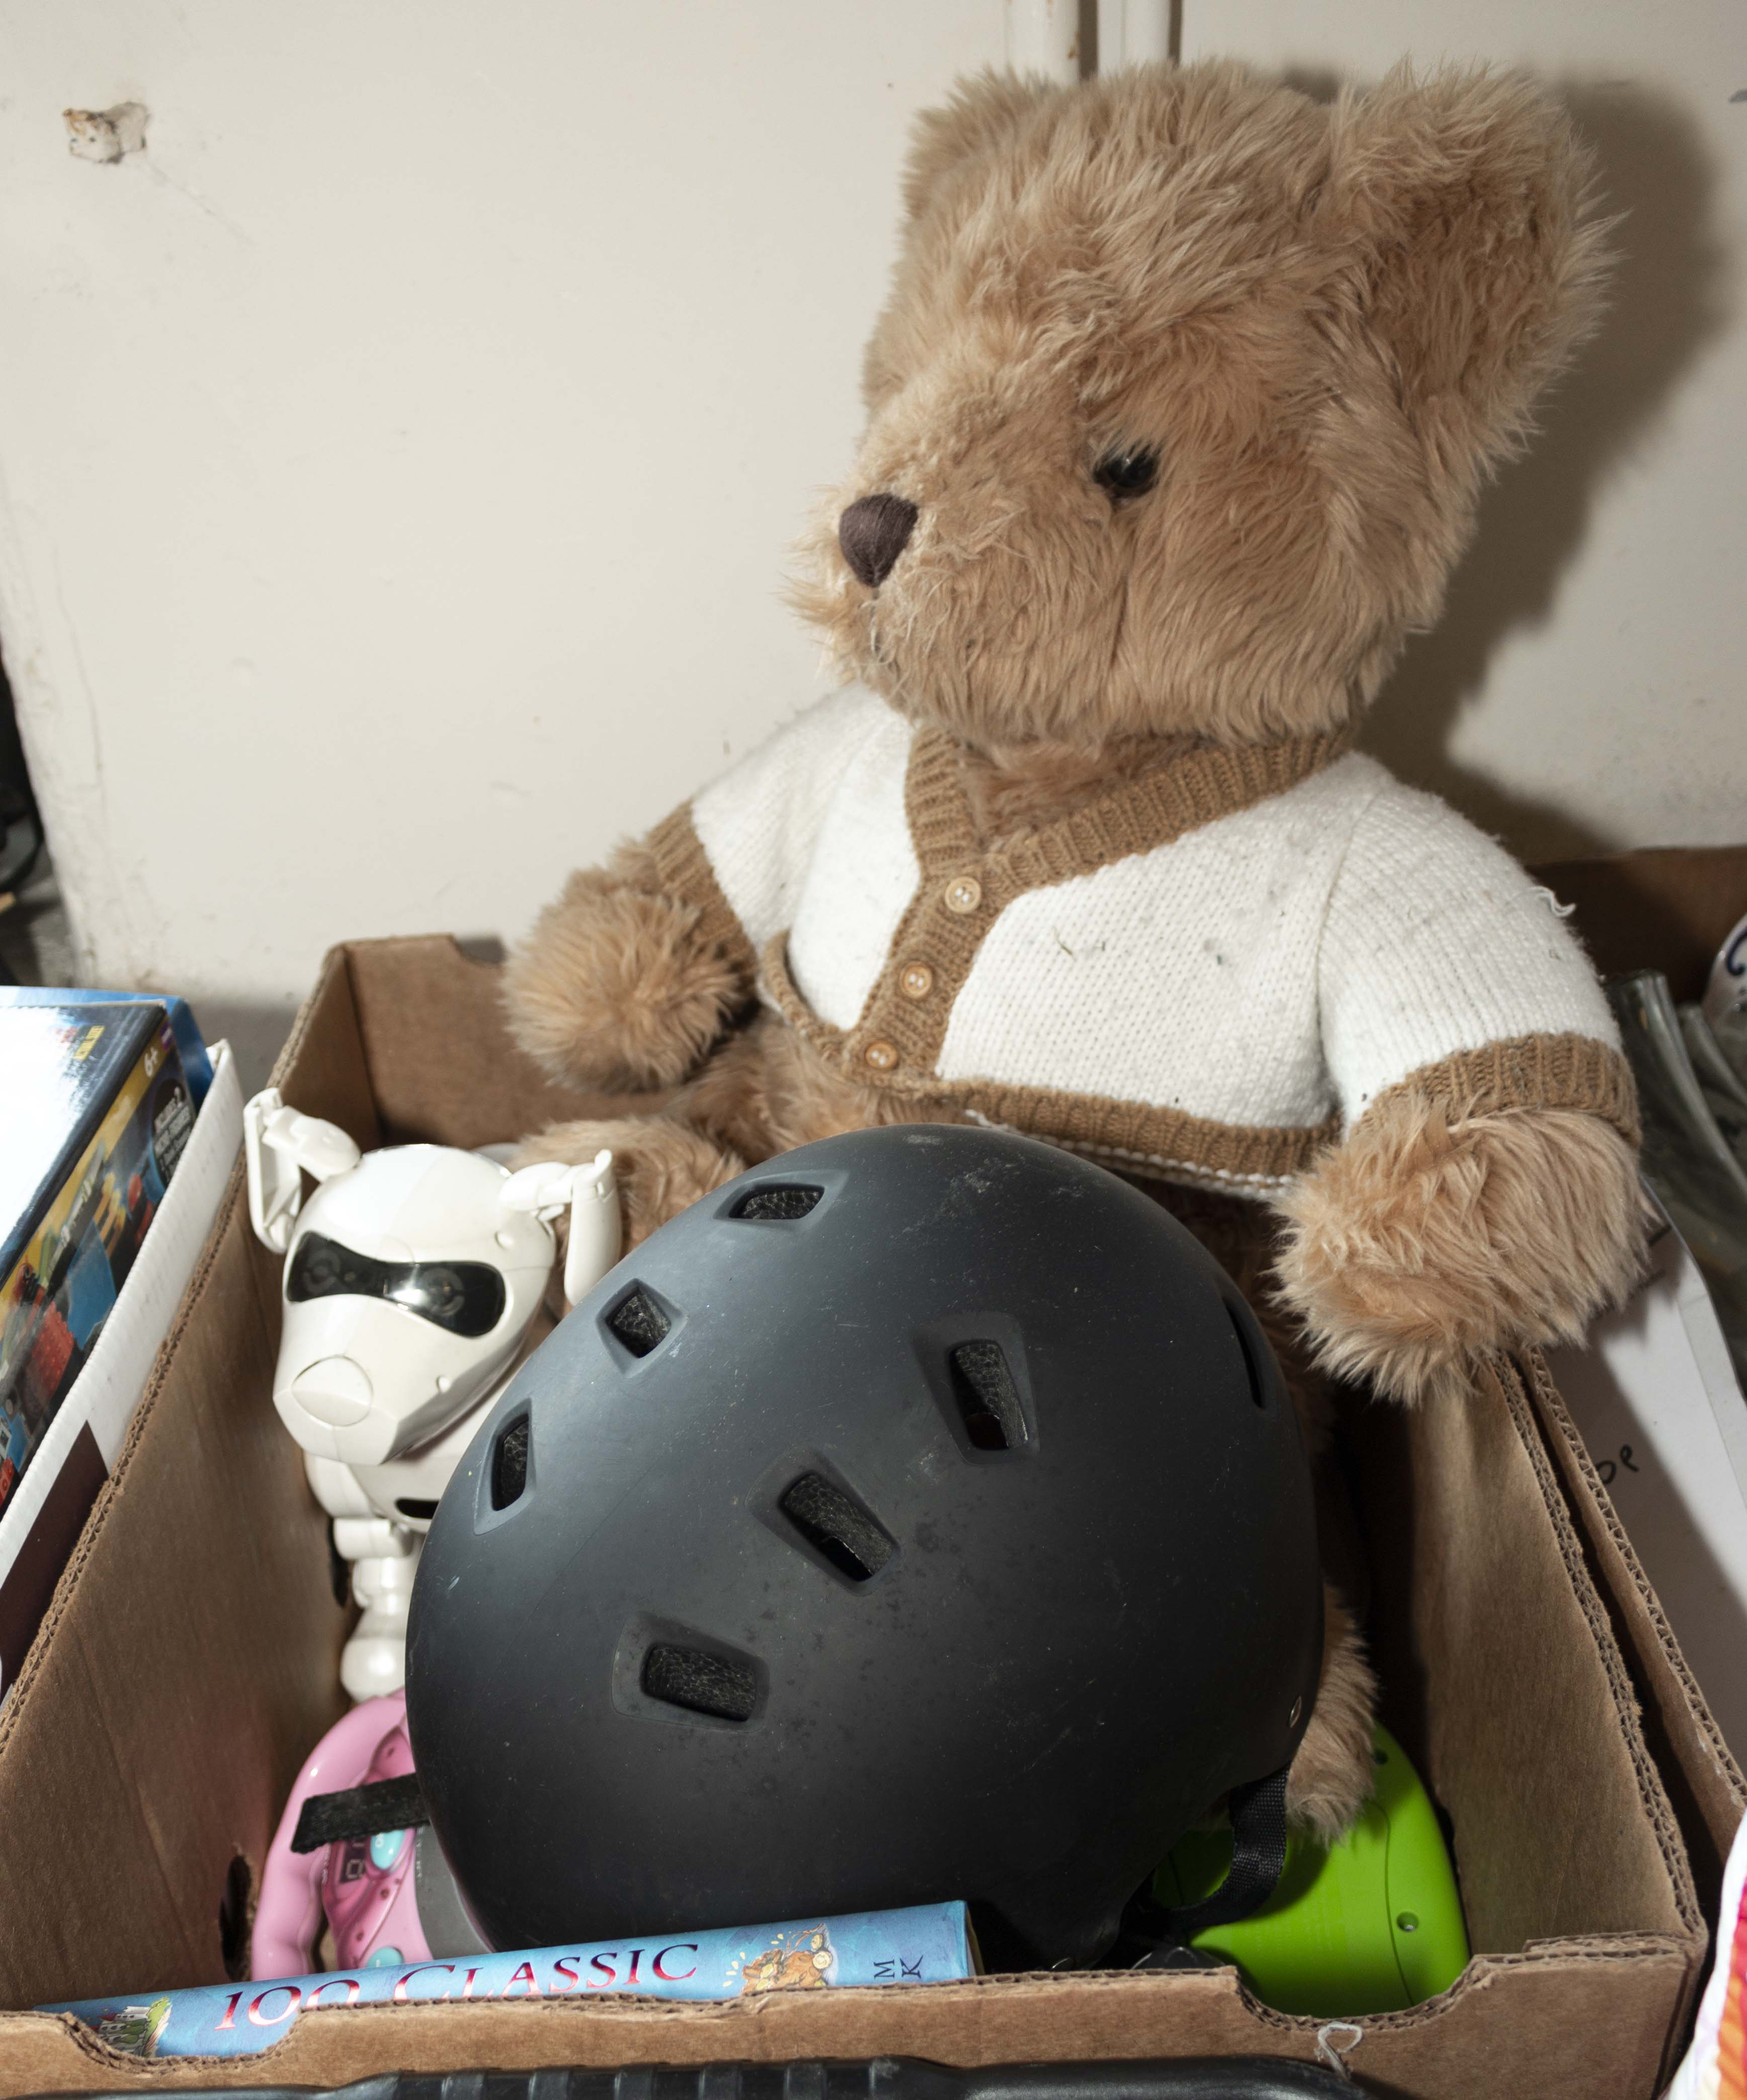 Lot 32 - A bike helmet, teddy bear and other toys